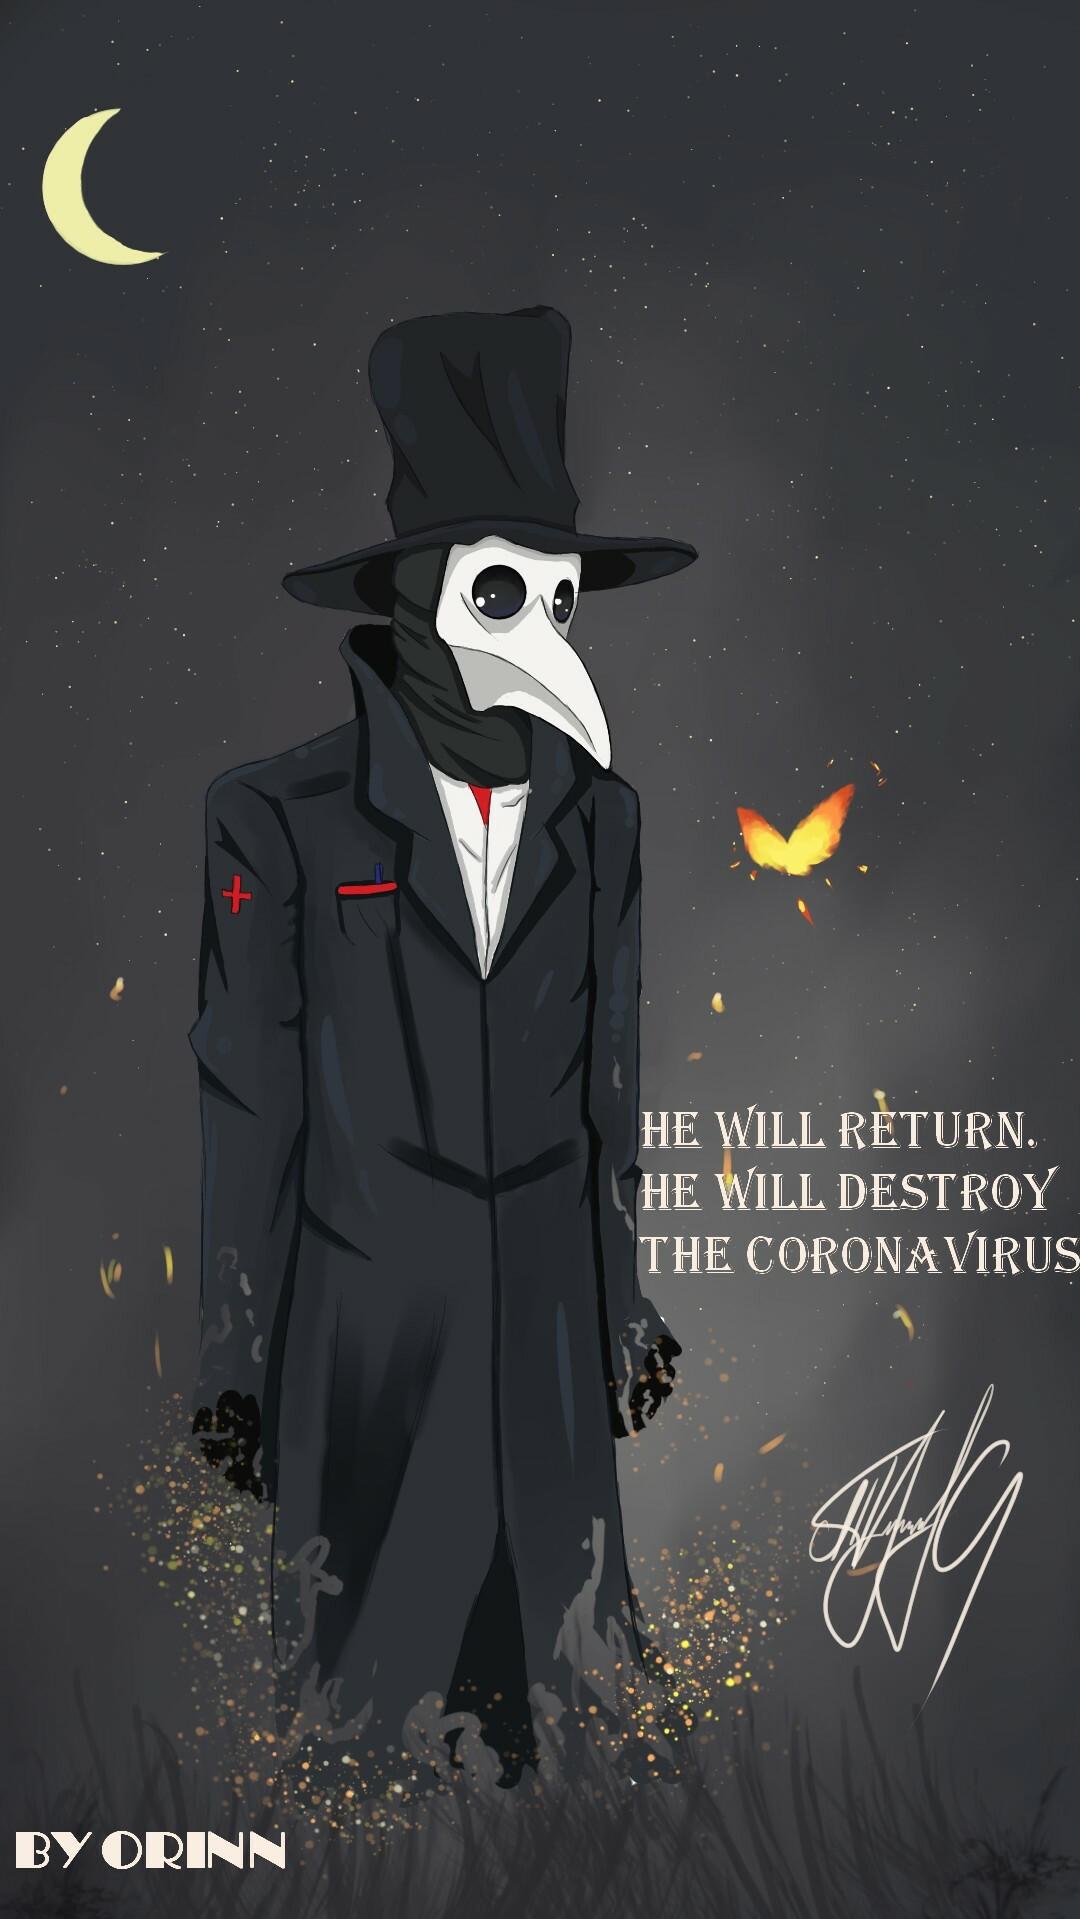 Coronavirus Doctor by Orinn Orinn, Ukraine | Coronavirus Inspired Artworks by Freelancers Around the World